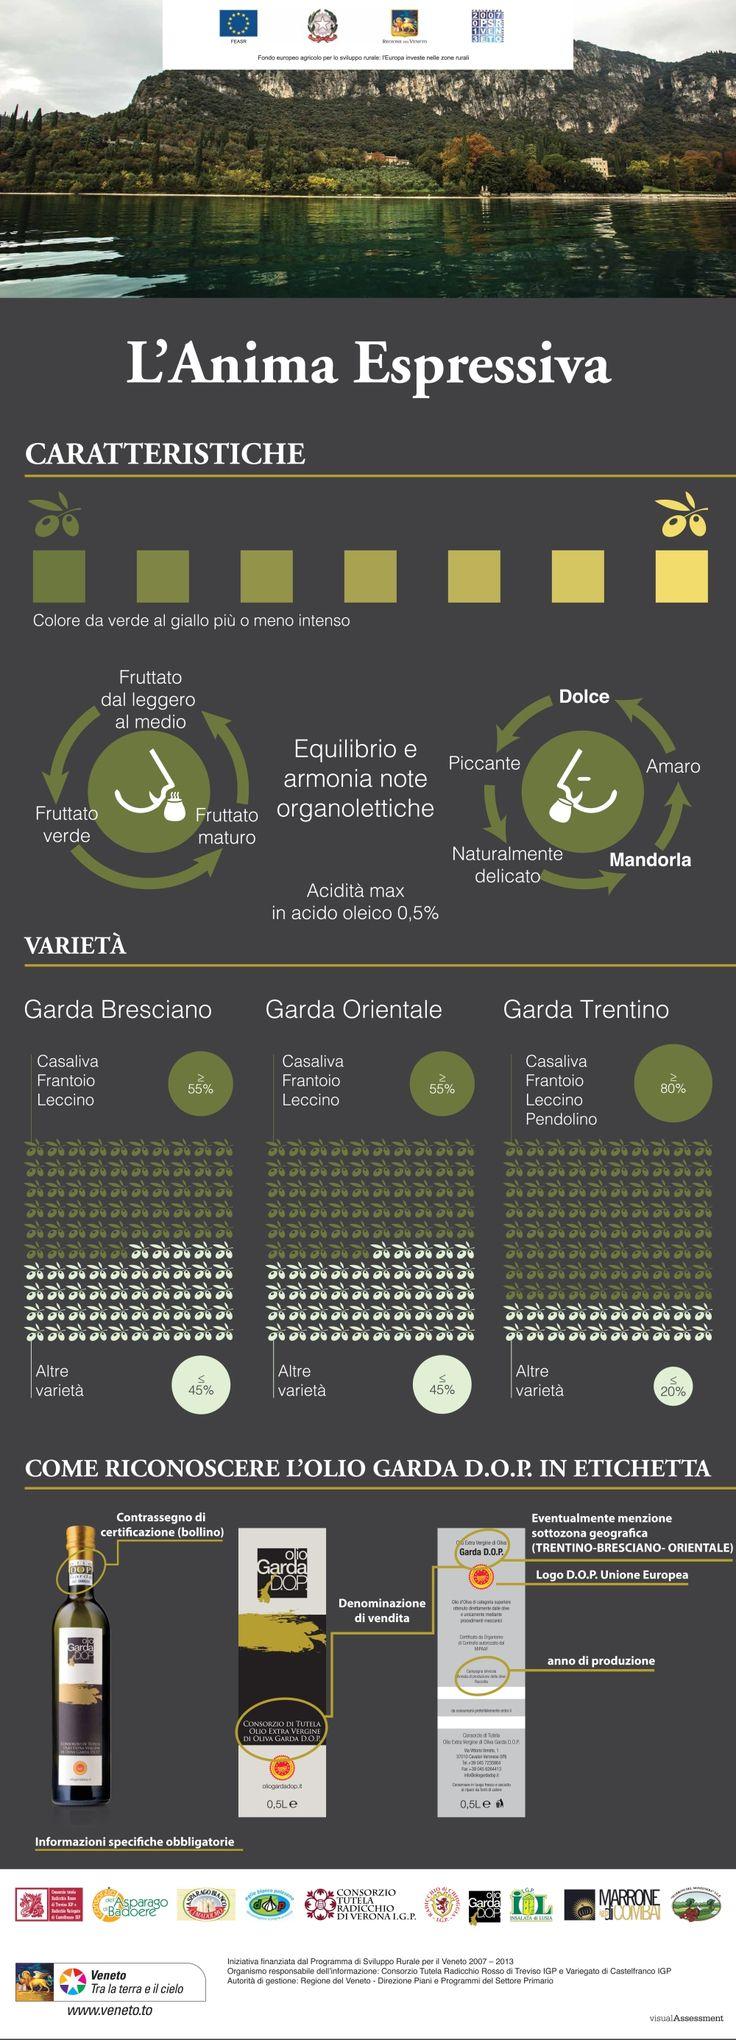 olio garda dop infografica 3